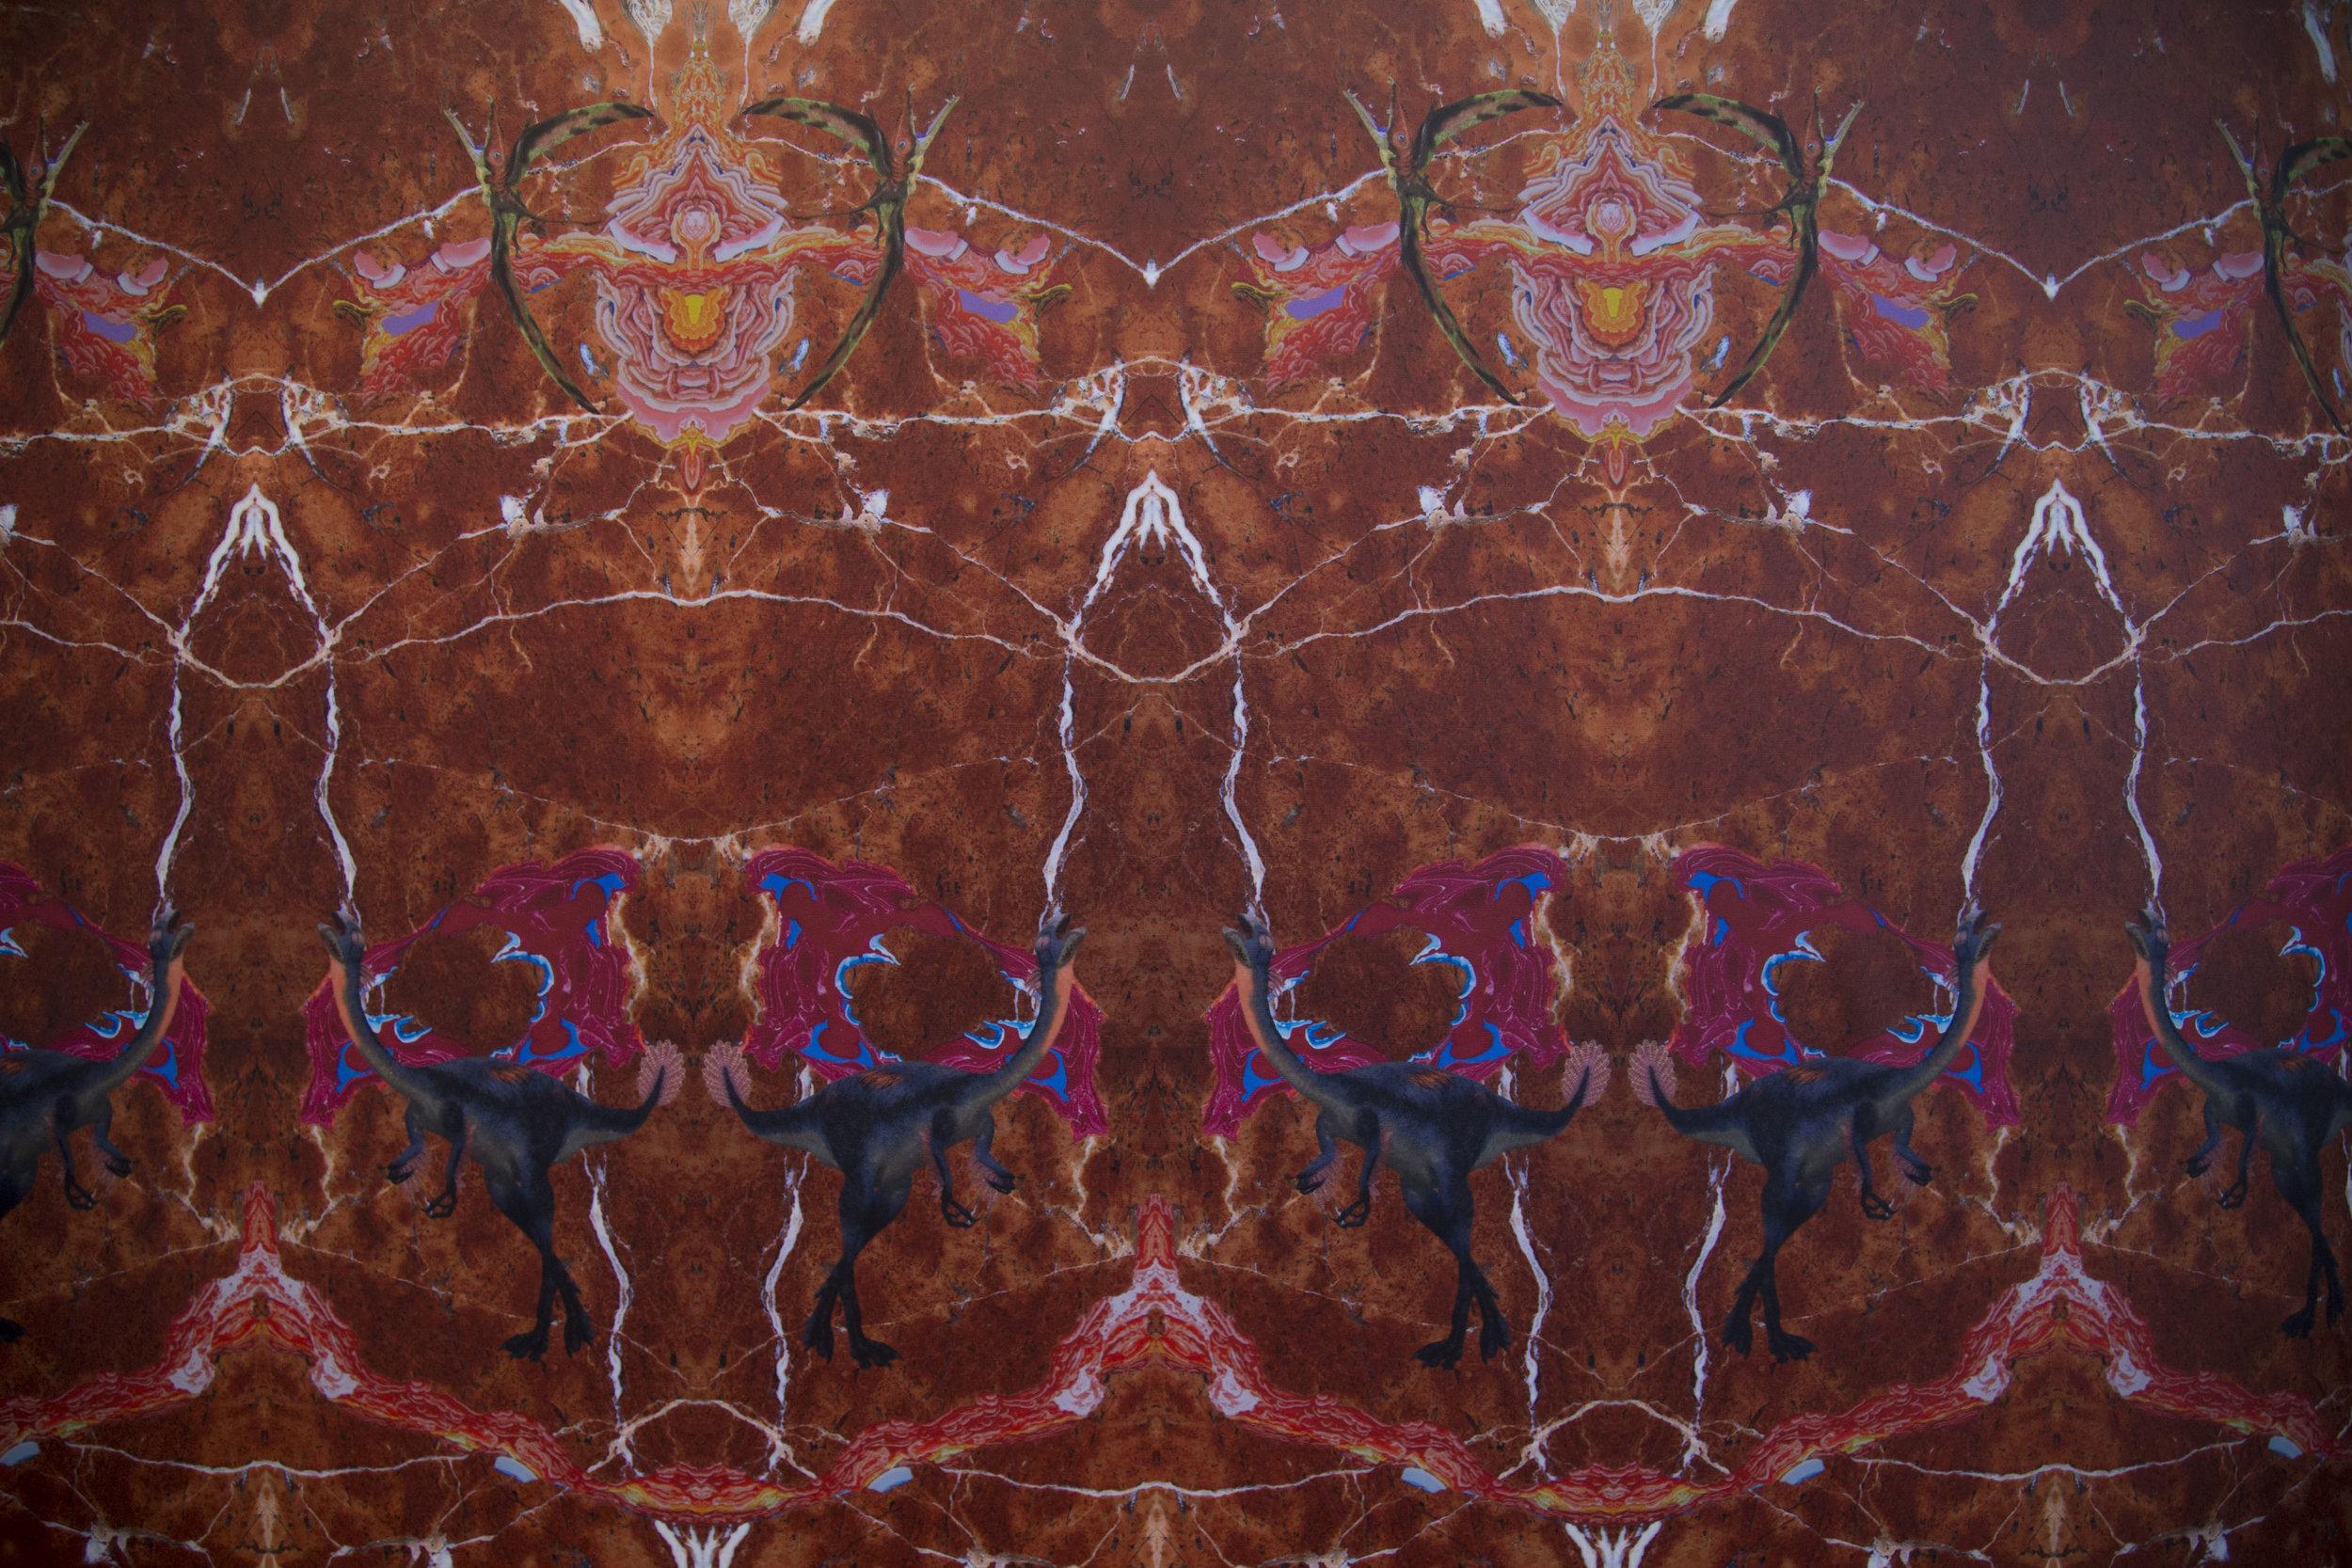 Kerstin Brätsch   Towards An Alphabet [Dino Runes] , 2018, Digital print on Photo Tex, 99 x 44 inches (dimensions customizable), Edition of 10